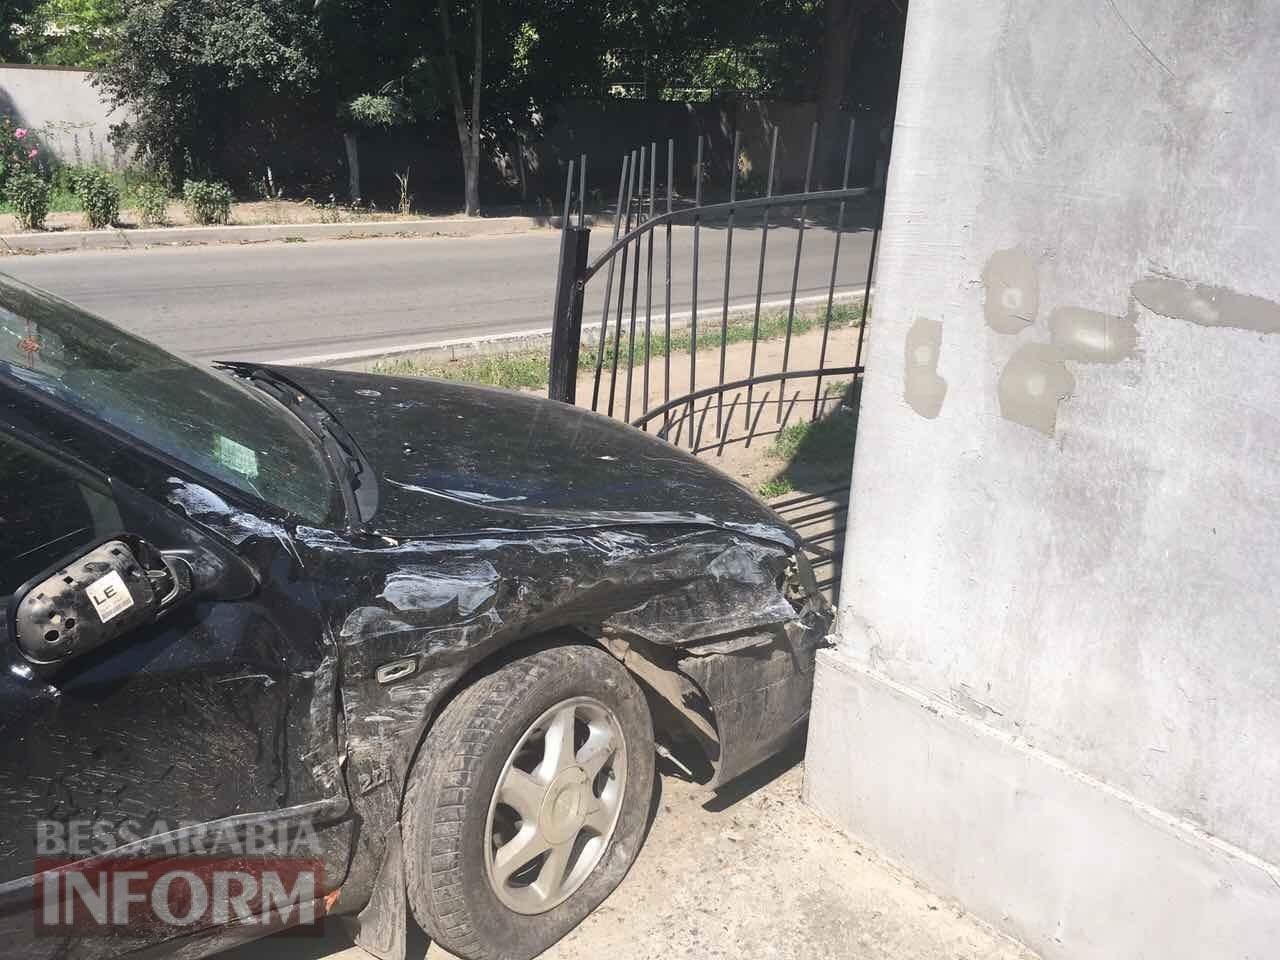 59315bb3309f9_34634632466 ДТП в Измаиле: дорогу не поделили Ford Tranzit и Nissan Primera